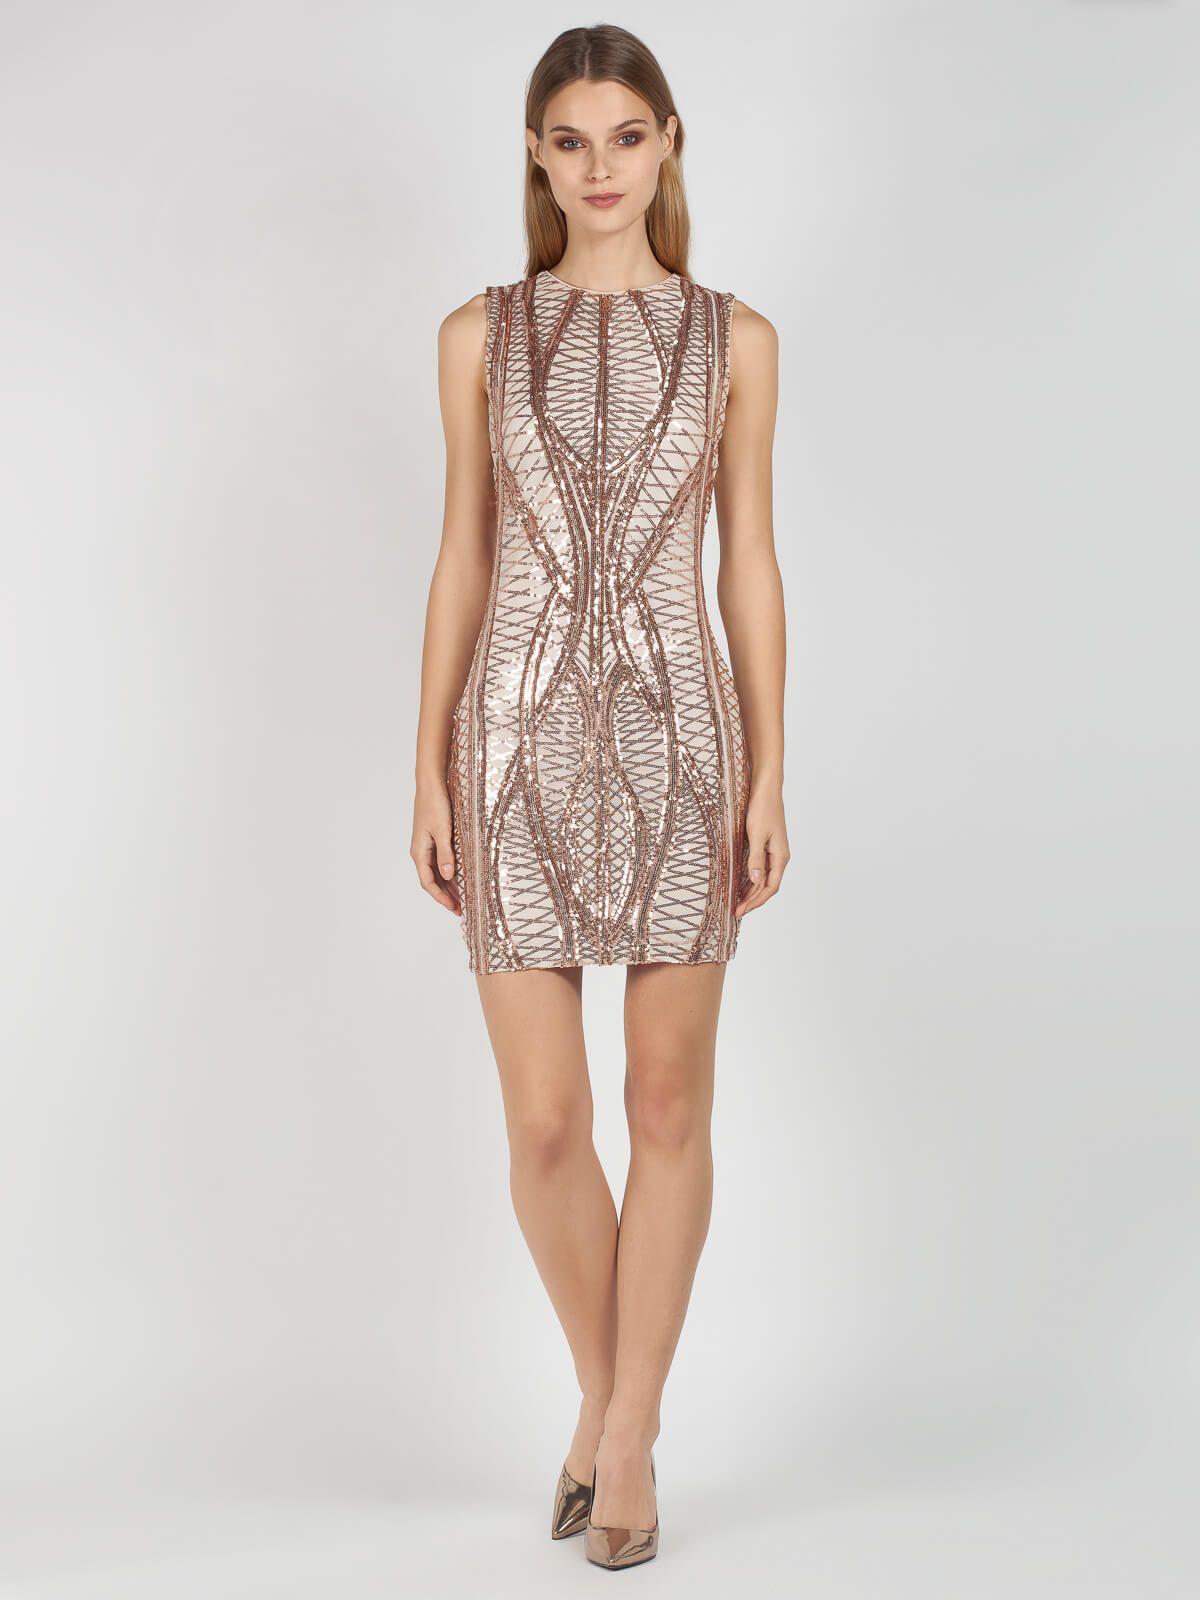 bbf5b5e3f0af Φόρεμα βραδινό αμάνικο σε ίσια γραμμή και μήκος μέχρι το γόνατο. Το φόρεμα  είναι από μπεζ τούλι κεντημένο με χρυσές παγιέτες σε ιδιαίτερο σχέδιο …